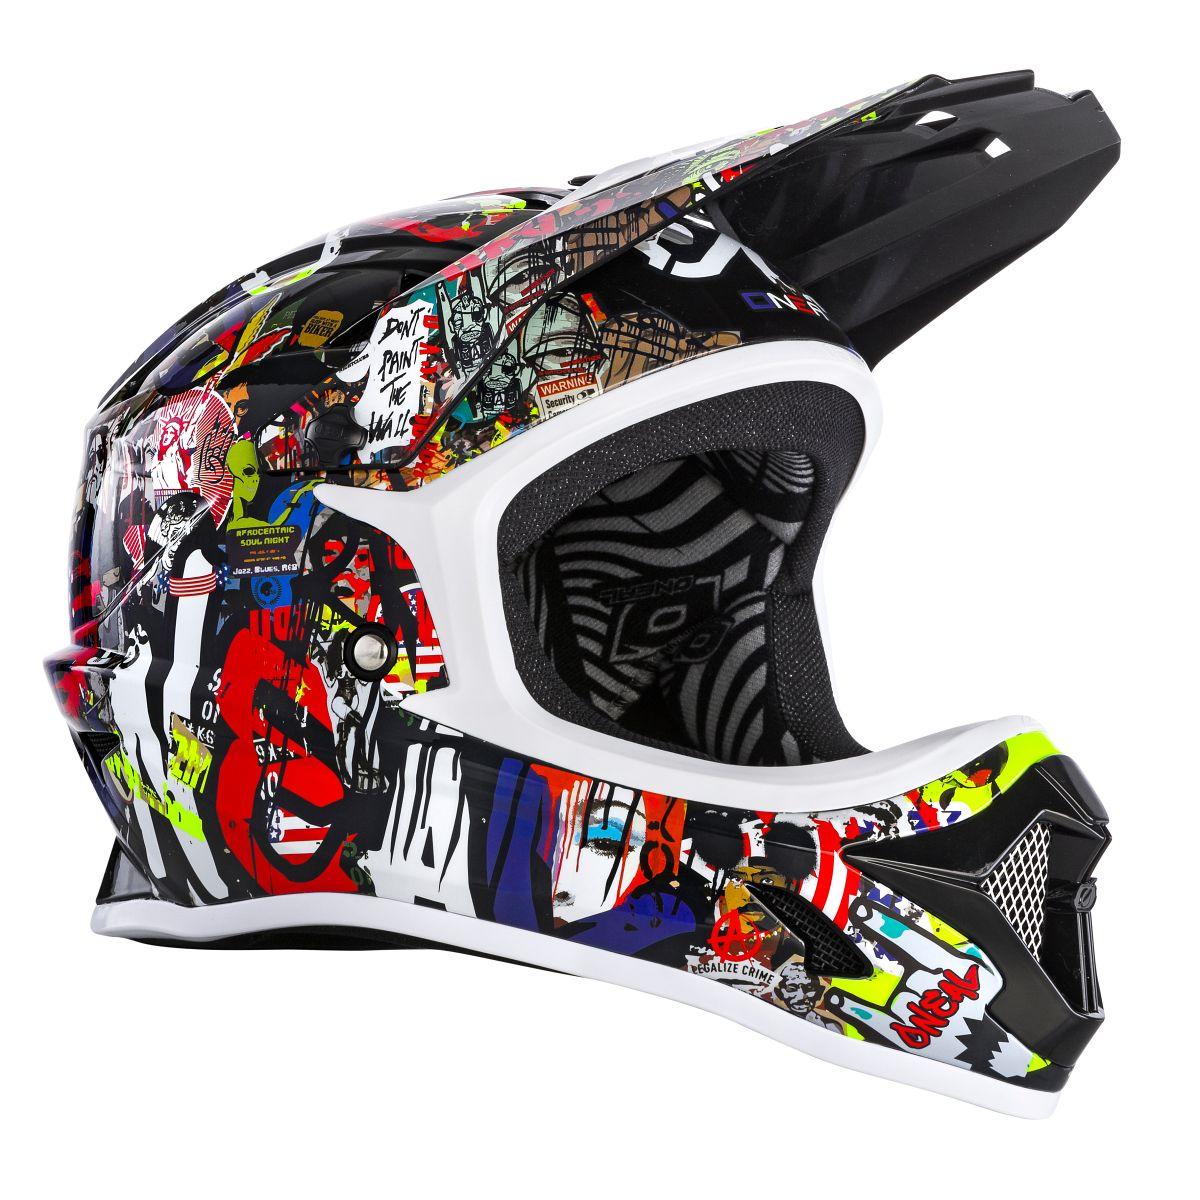 ONEAL Backflip Rancid DH Fahrrad Helm schwarz//Multi 2020 Oneal